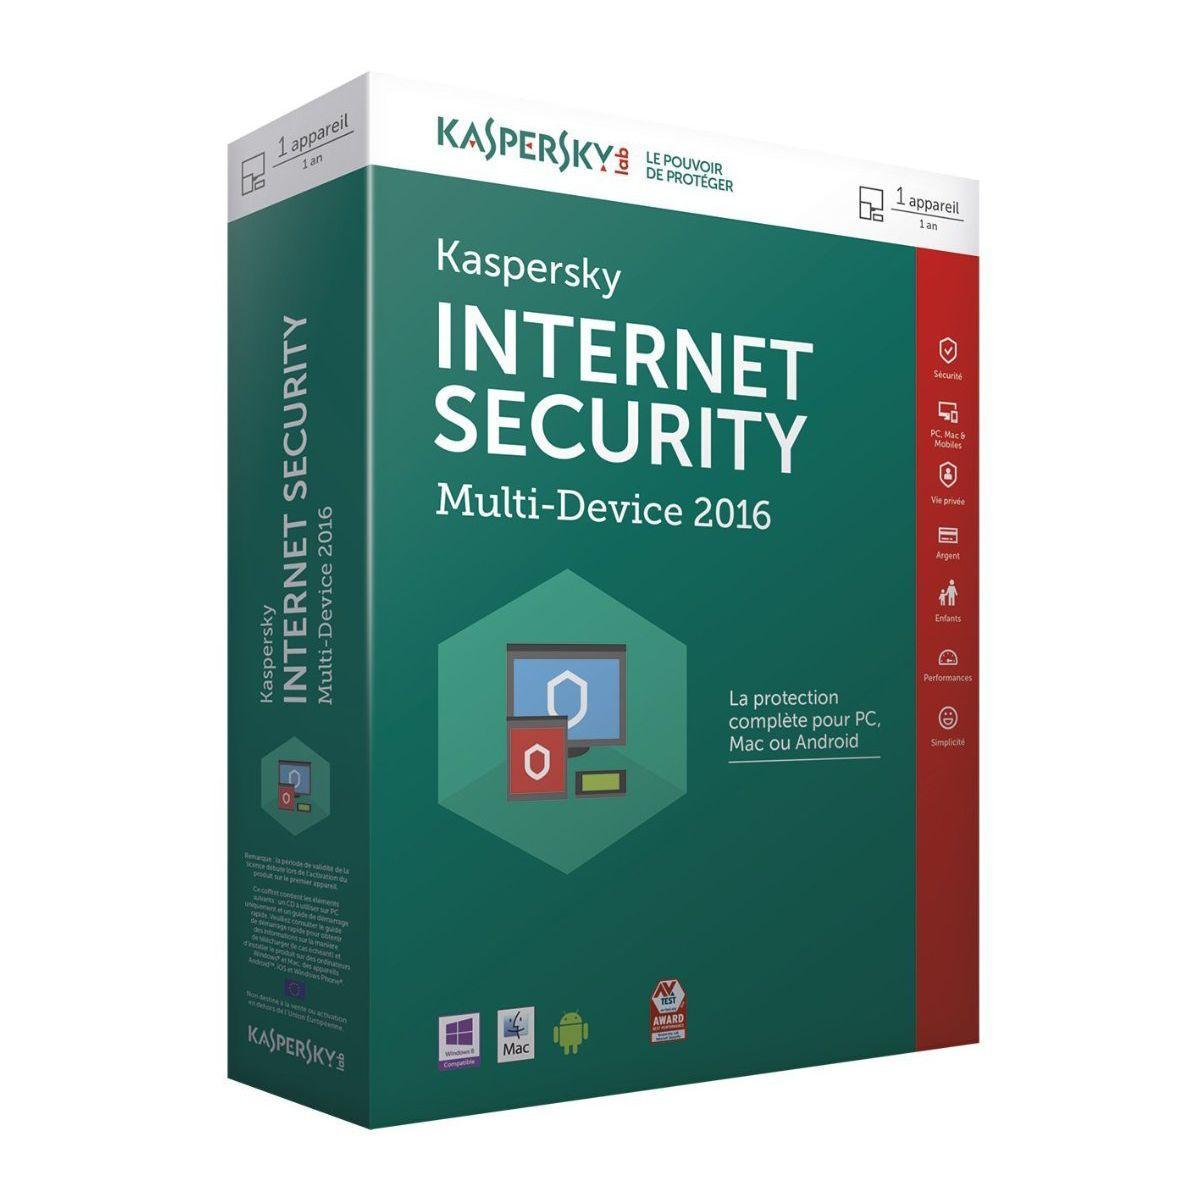 Logiciel pc kaspersky internet security 2016 – 5 € de remise : code cash5